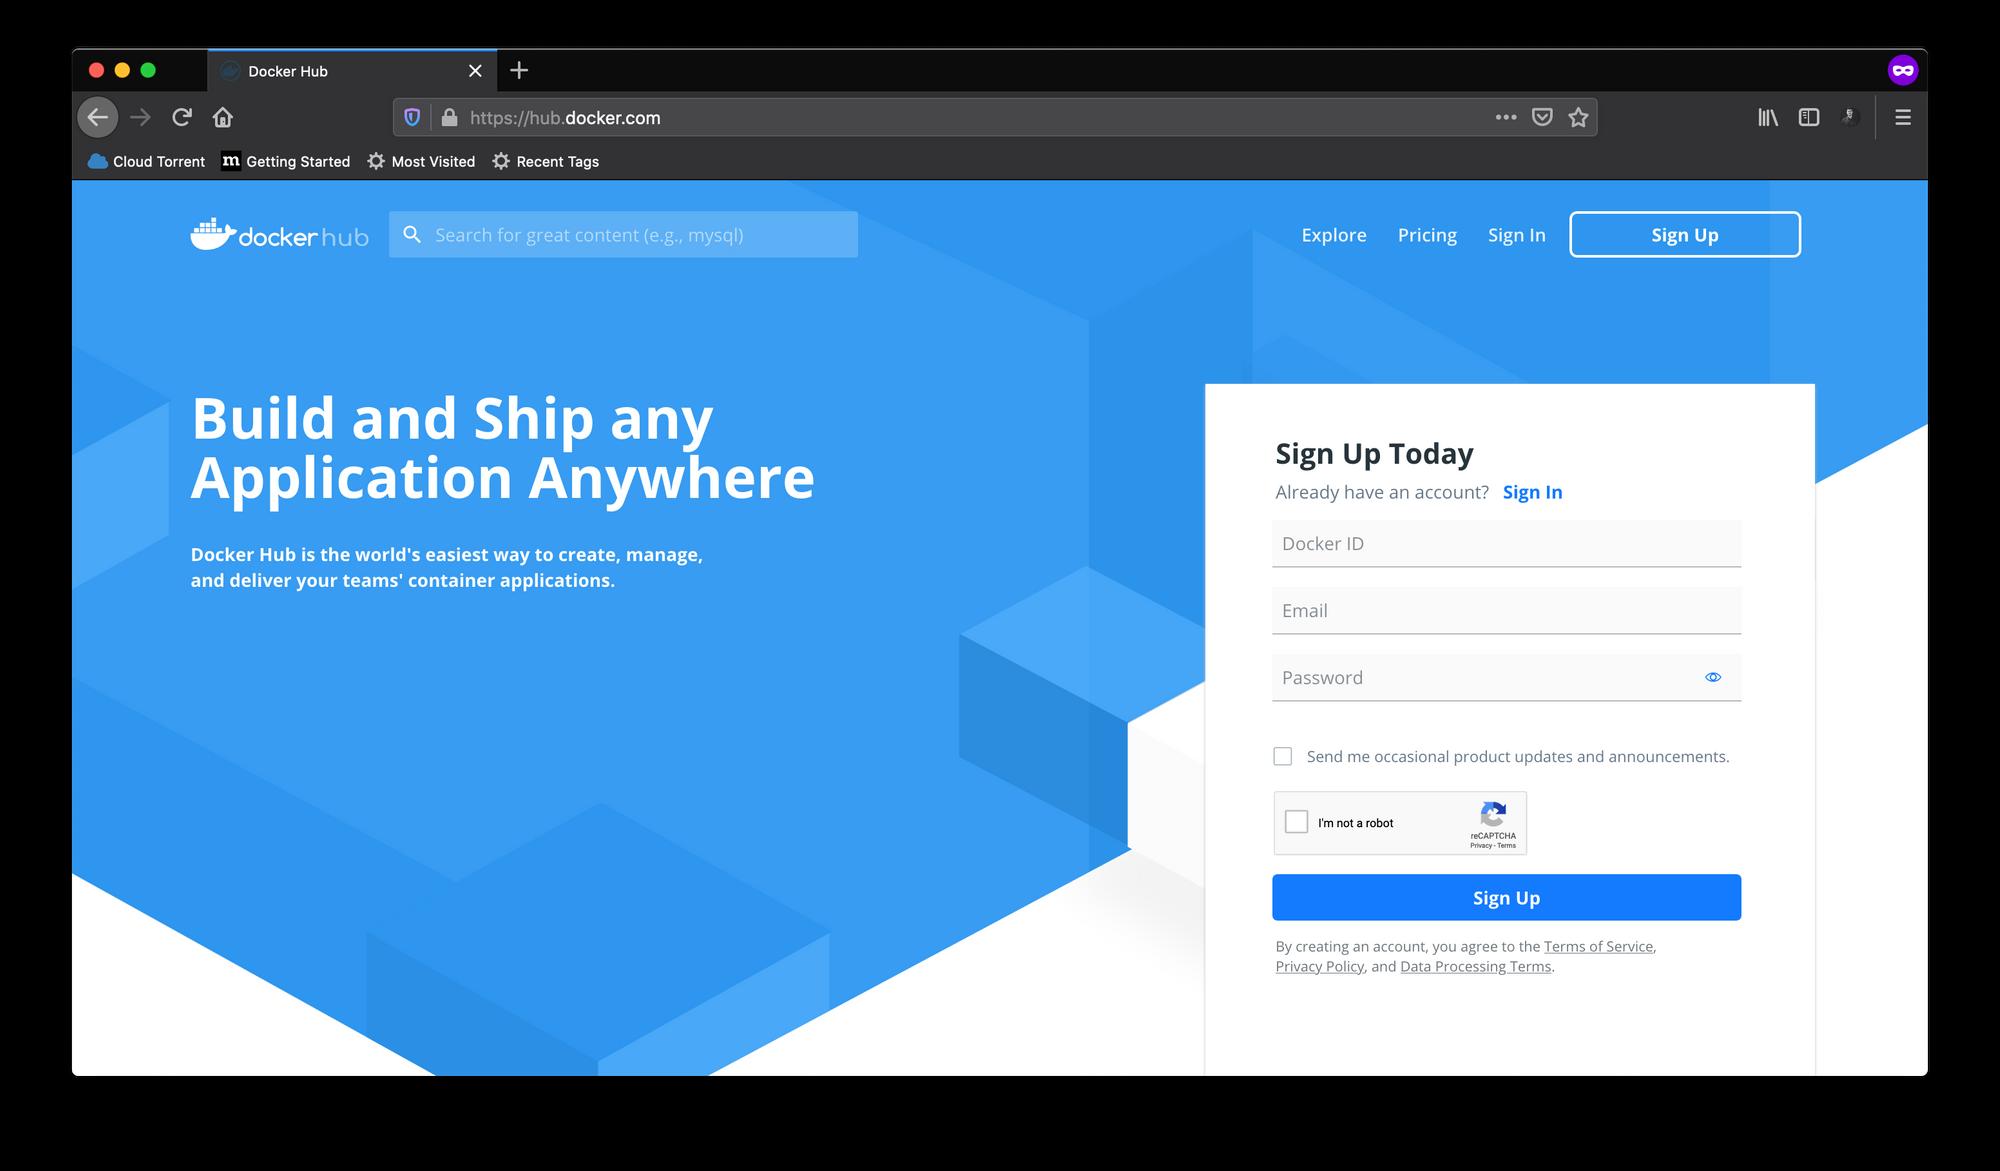 Docker Hubでサインアップ